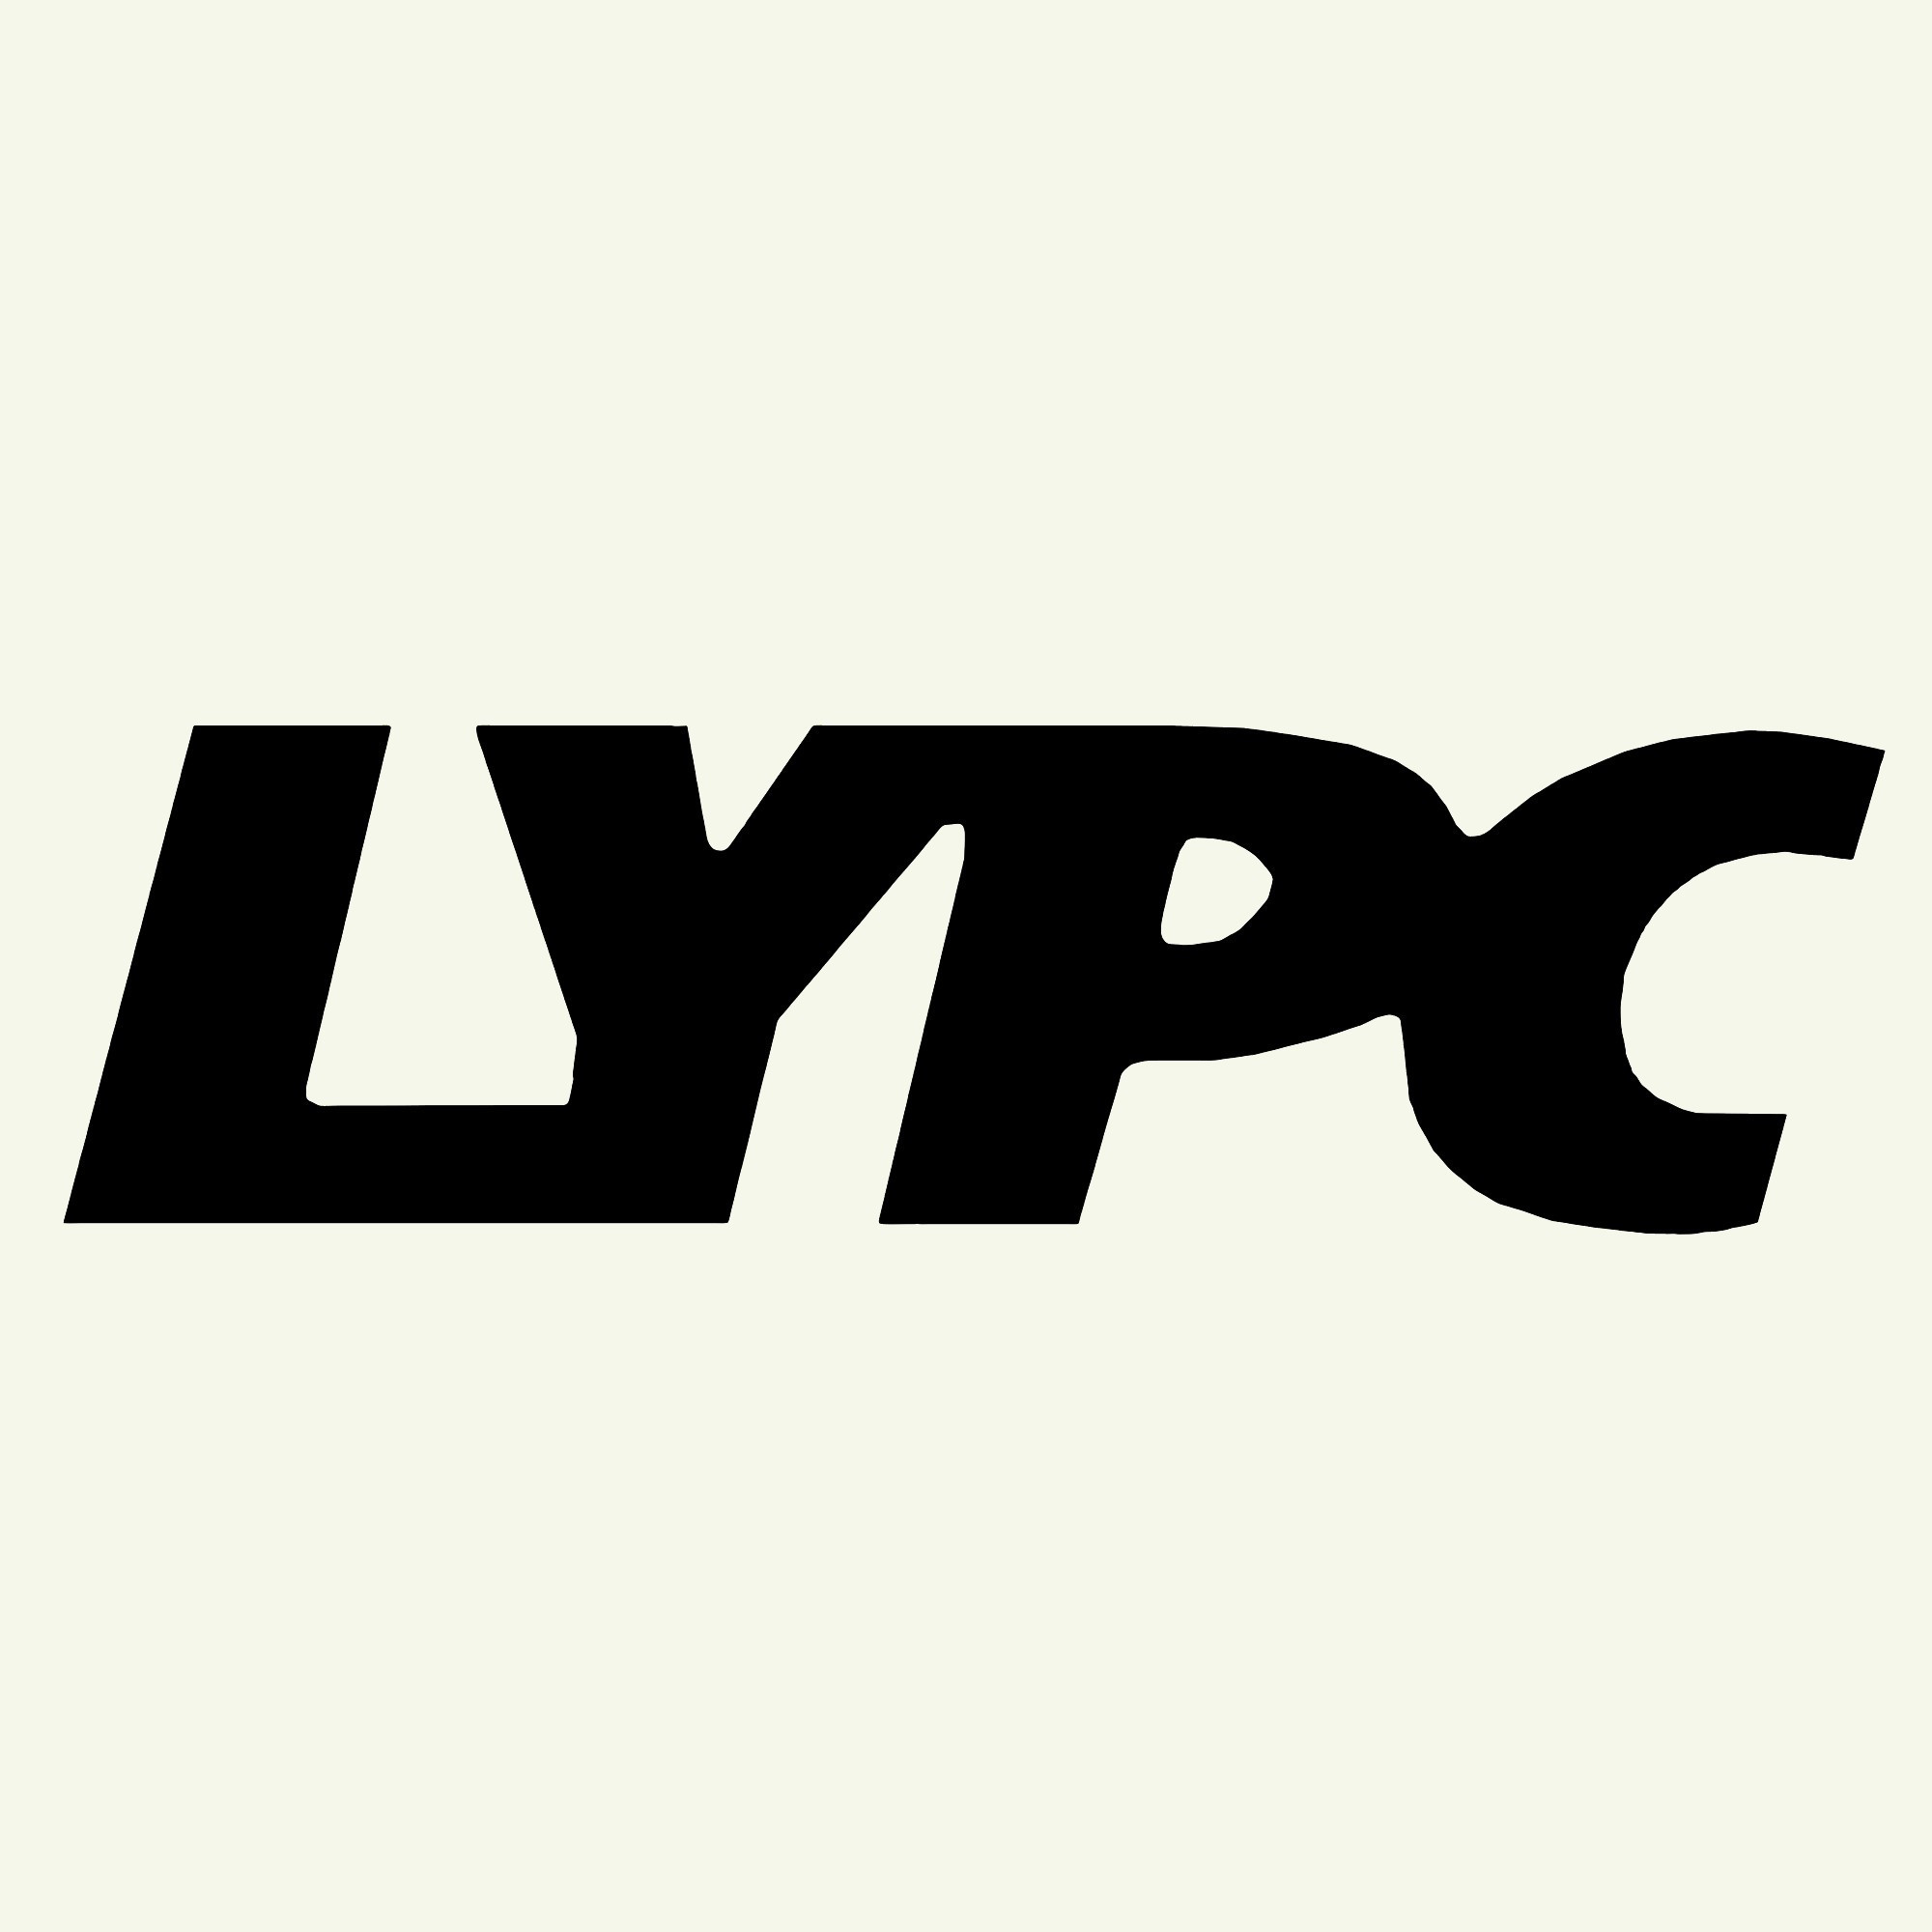 LYPC Vending Machines